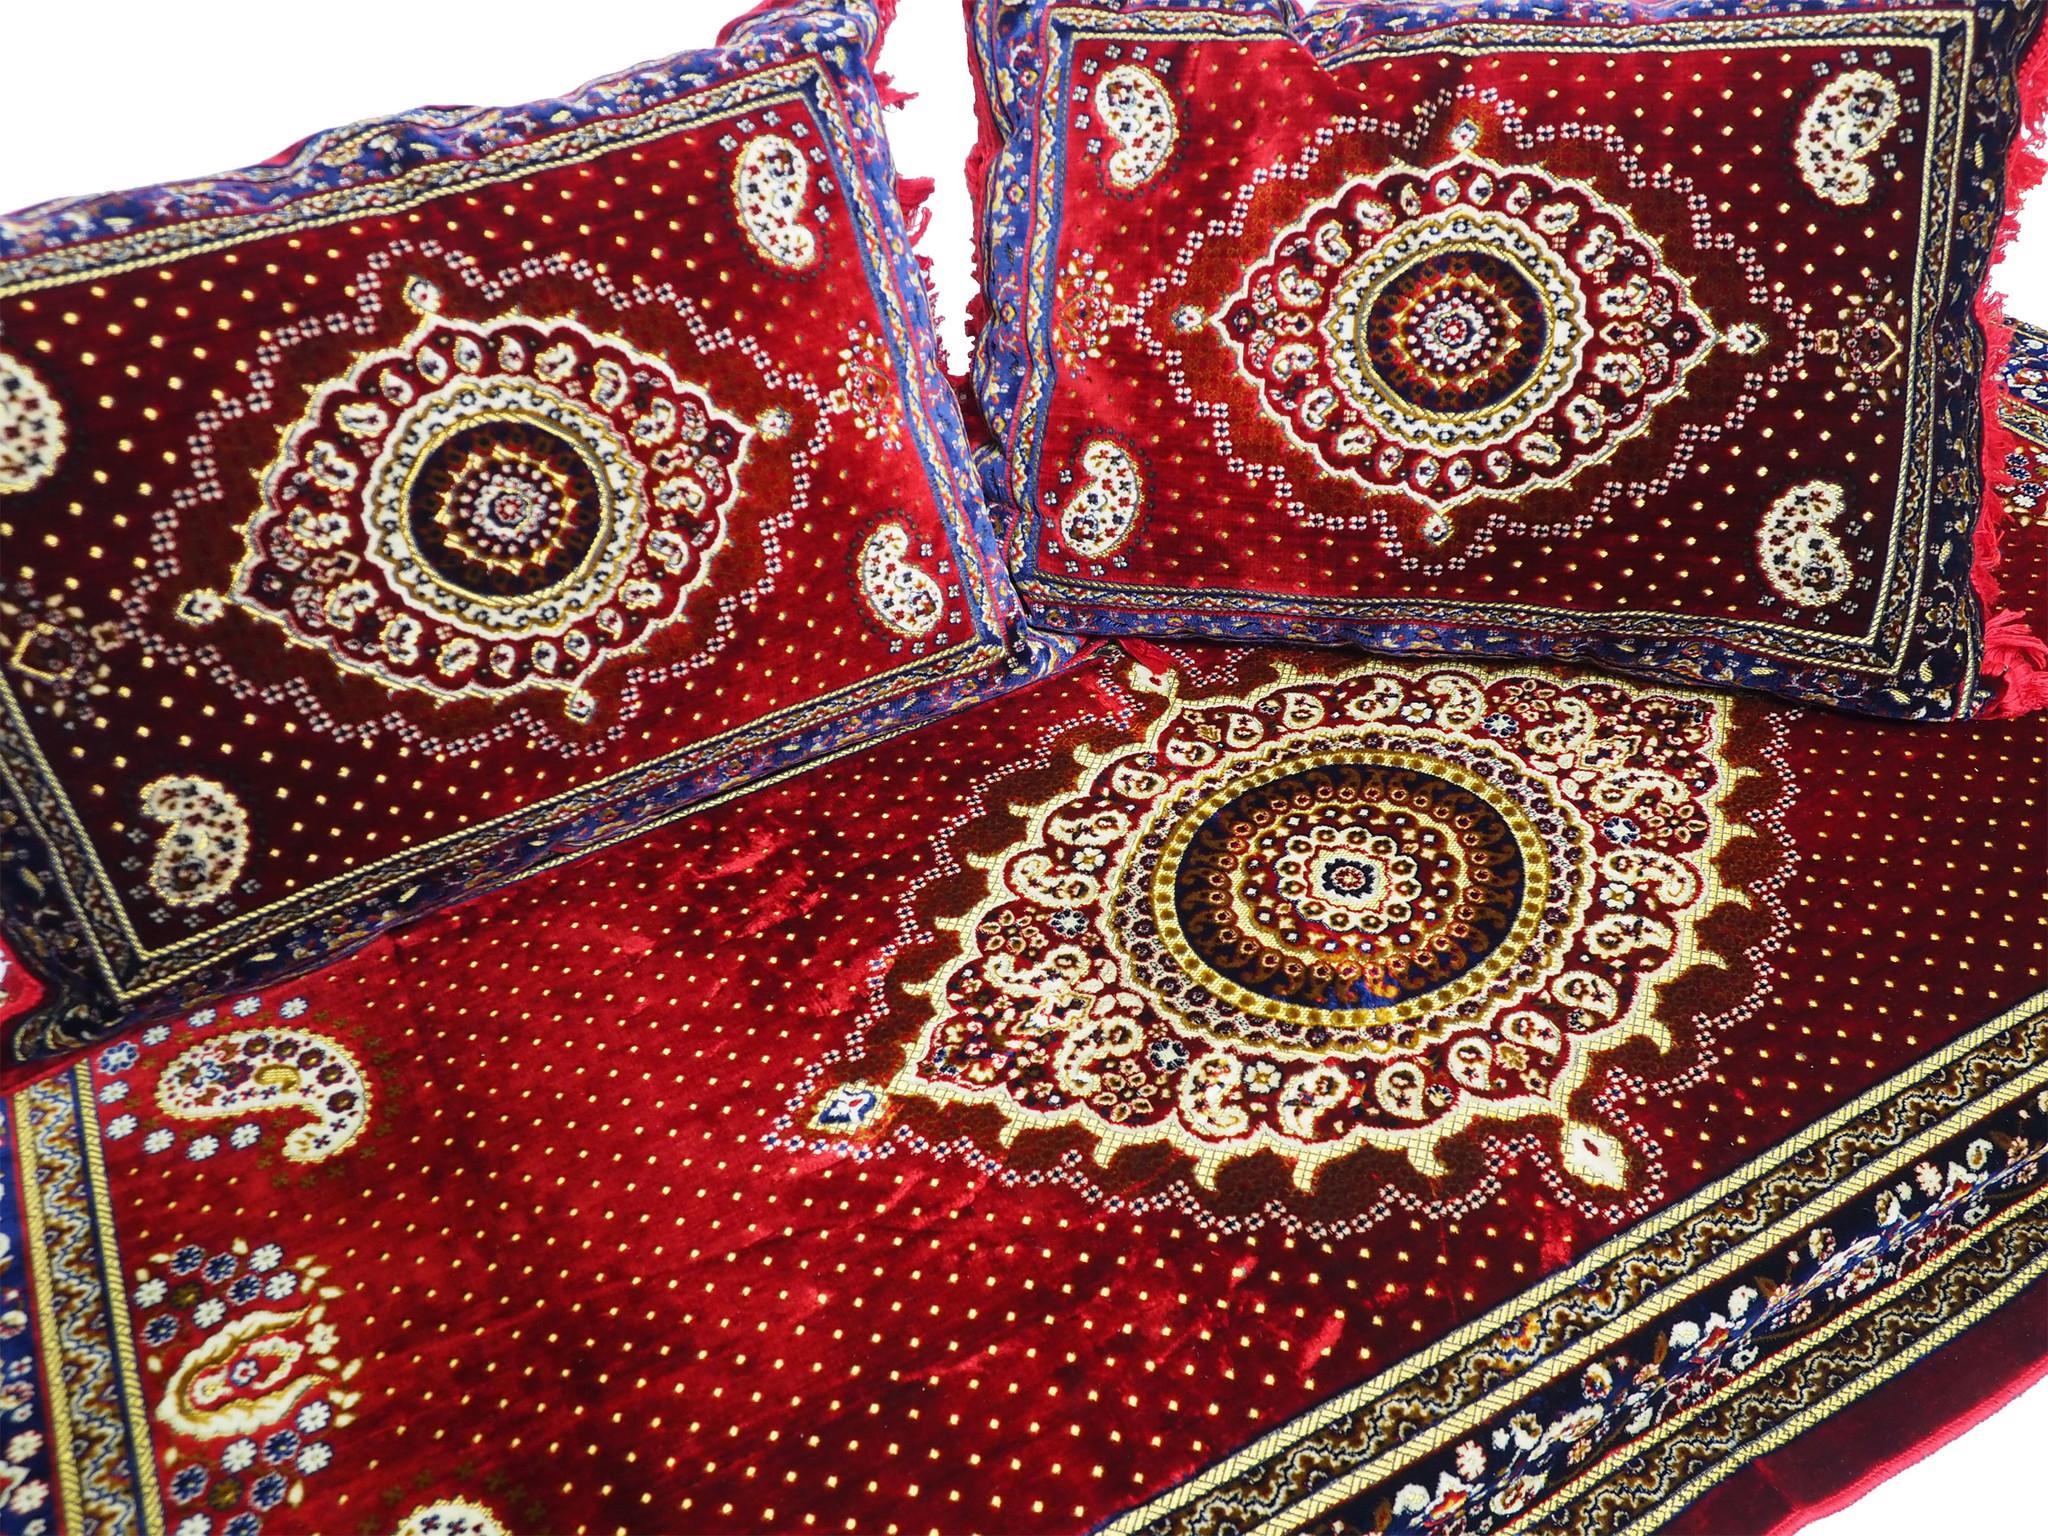 Set of 3 Pcs  1x Mattress  + 2x cushions orient Afghan nomad pillow rug seat floor cushion 1001-night Seating  majlis Toshak توشک  (Red21)